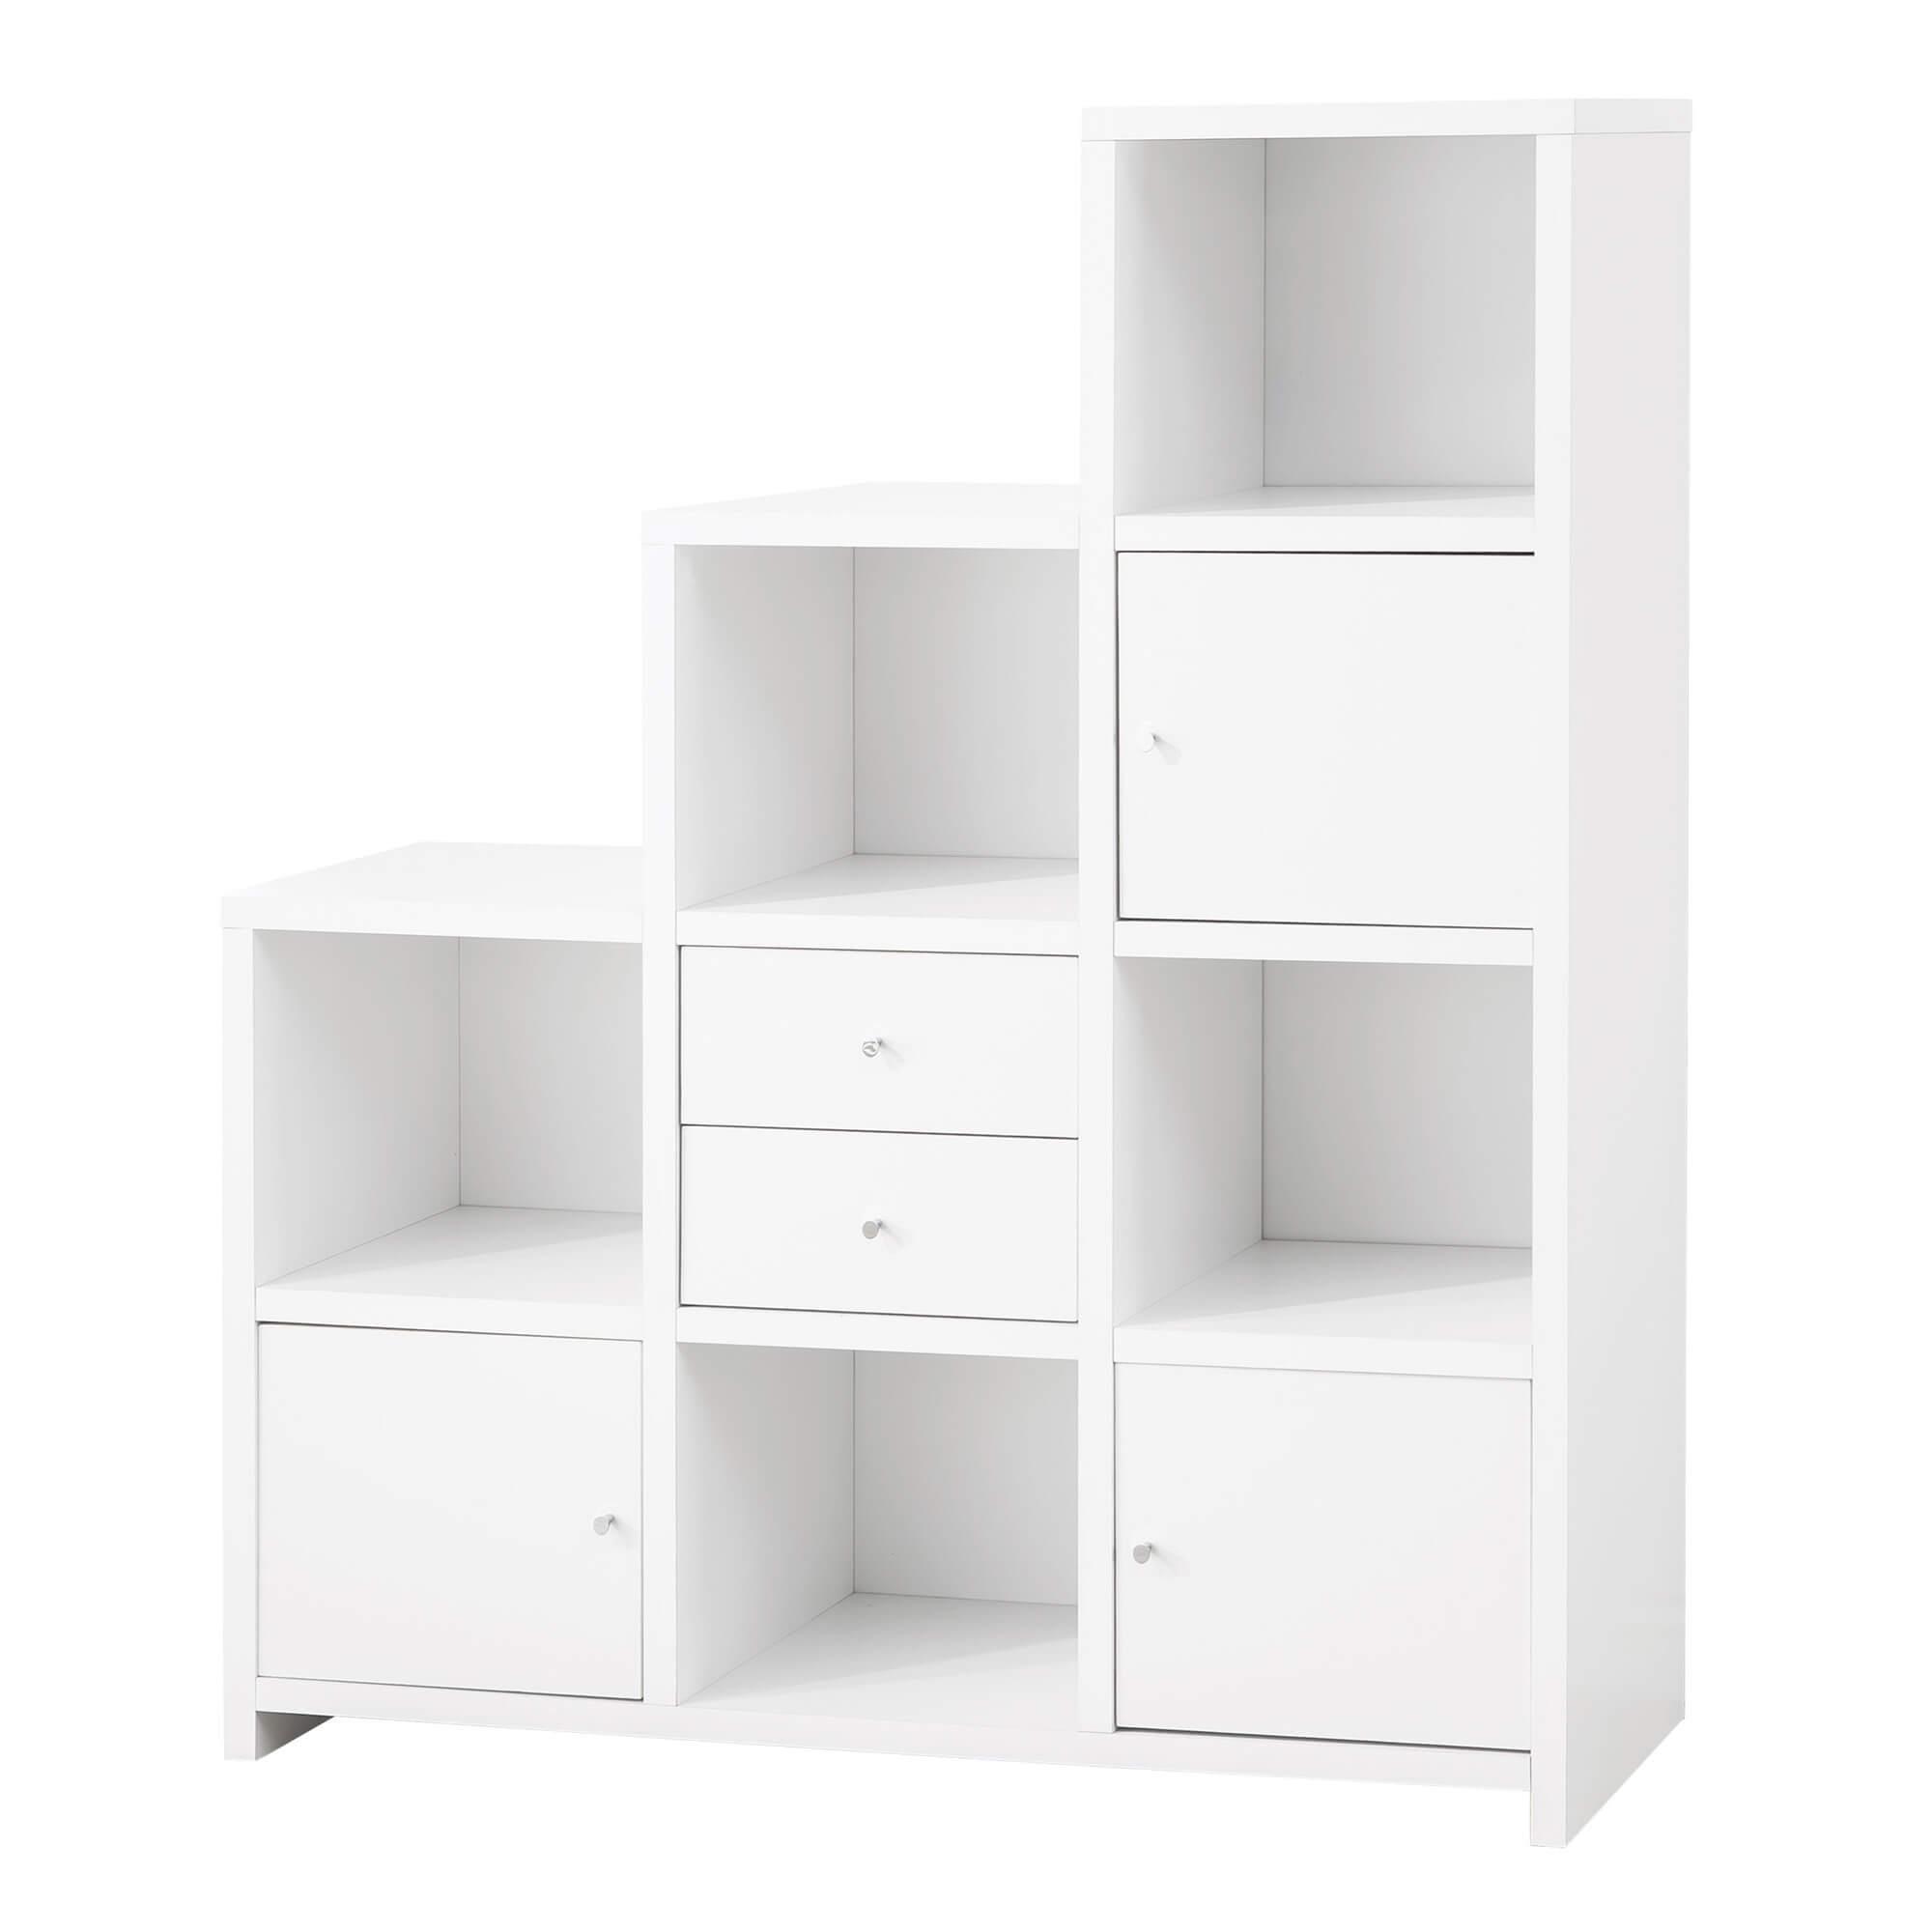 Here's a white 9-cube escalating bookshelf.